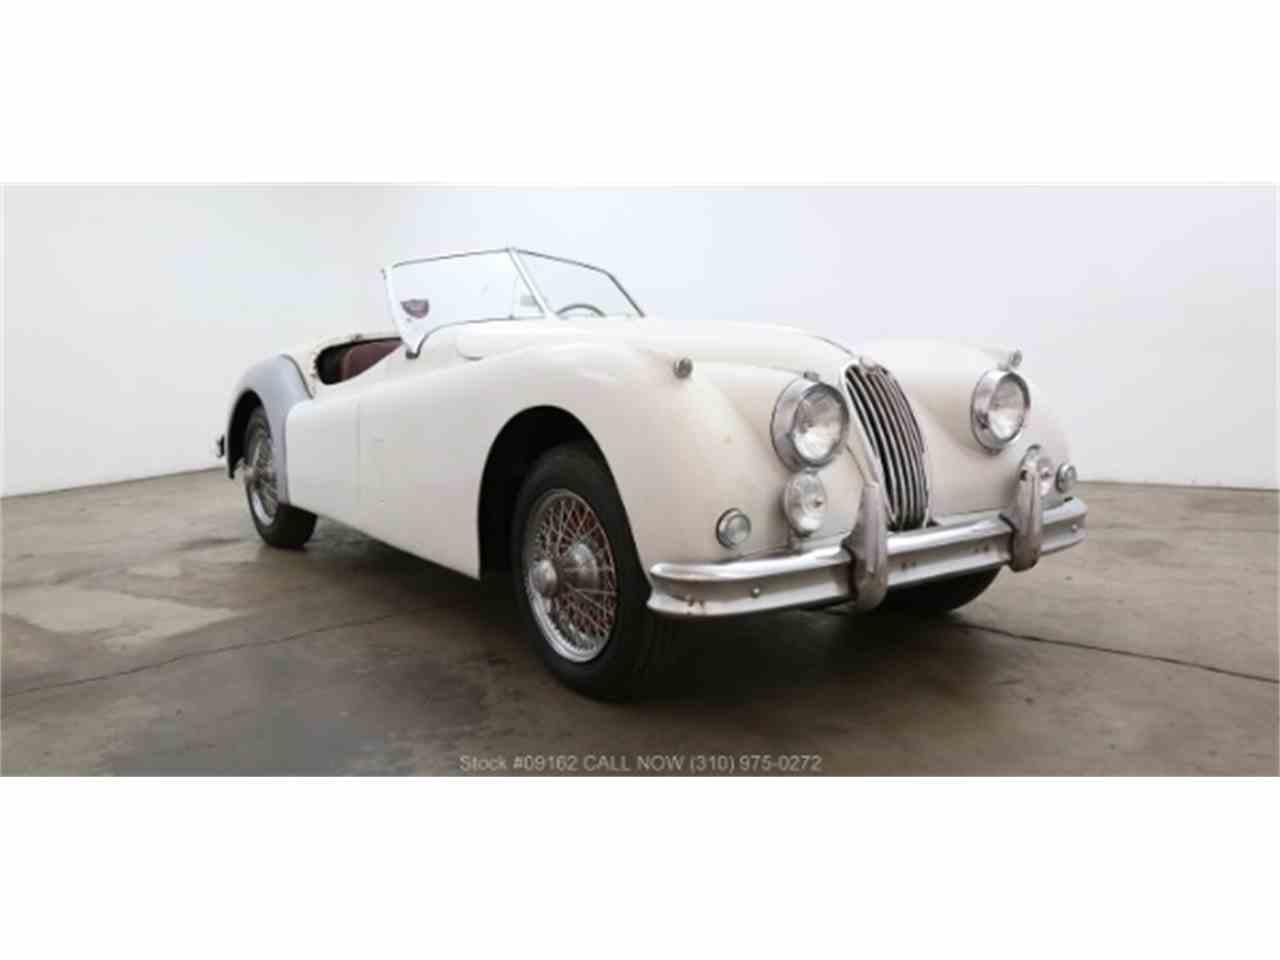 pistonheads dhc cars for sale jaguar classifieds mc head in drop used essex